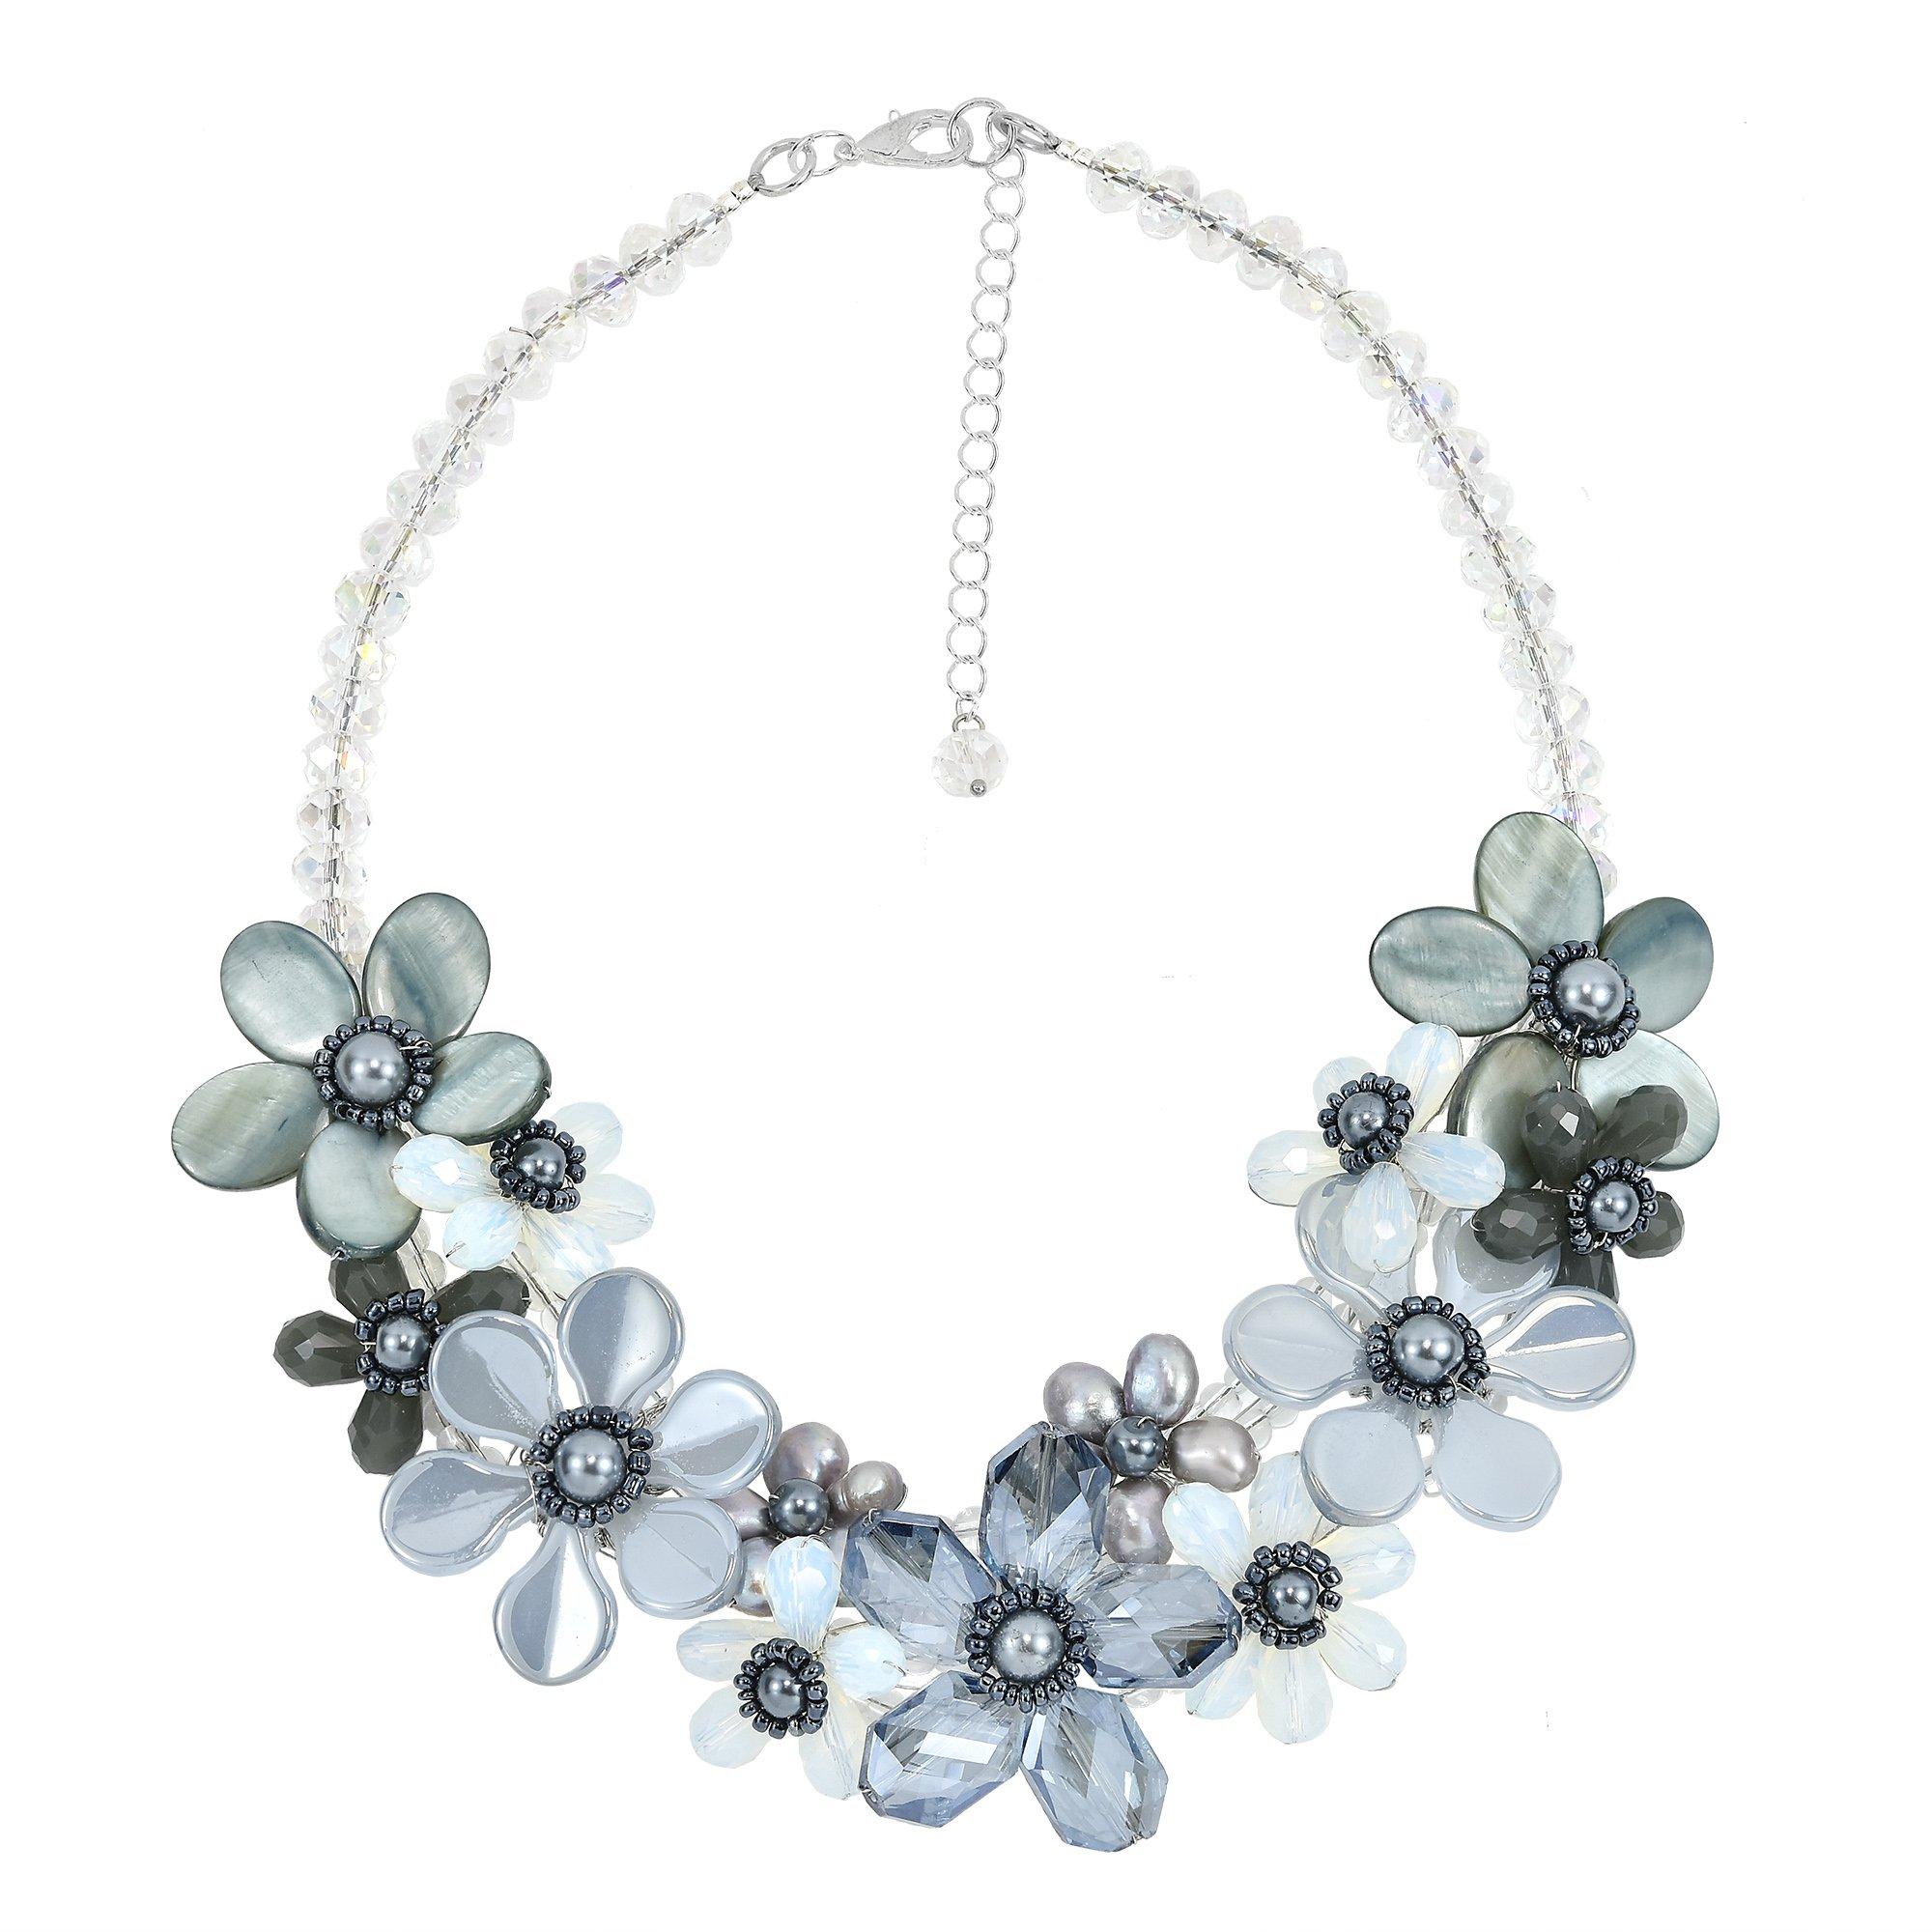 AeraVida Romantic Moonlight Smokey Floral Sparkling Fashion Crystal Statement Necklace